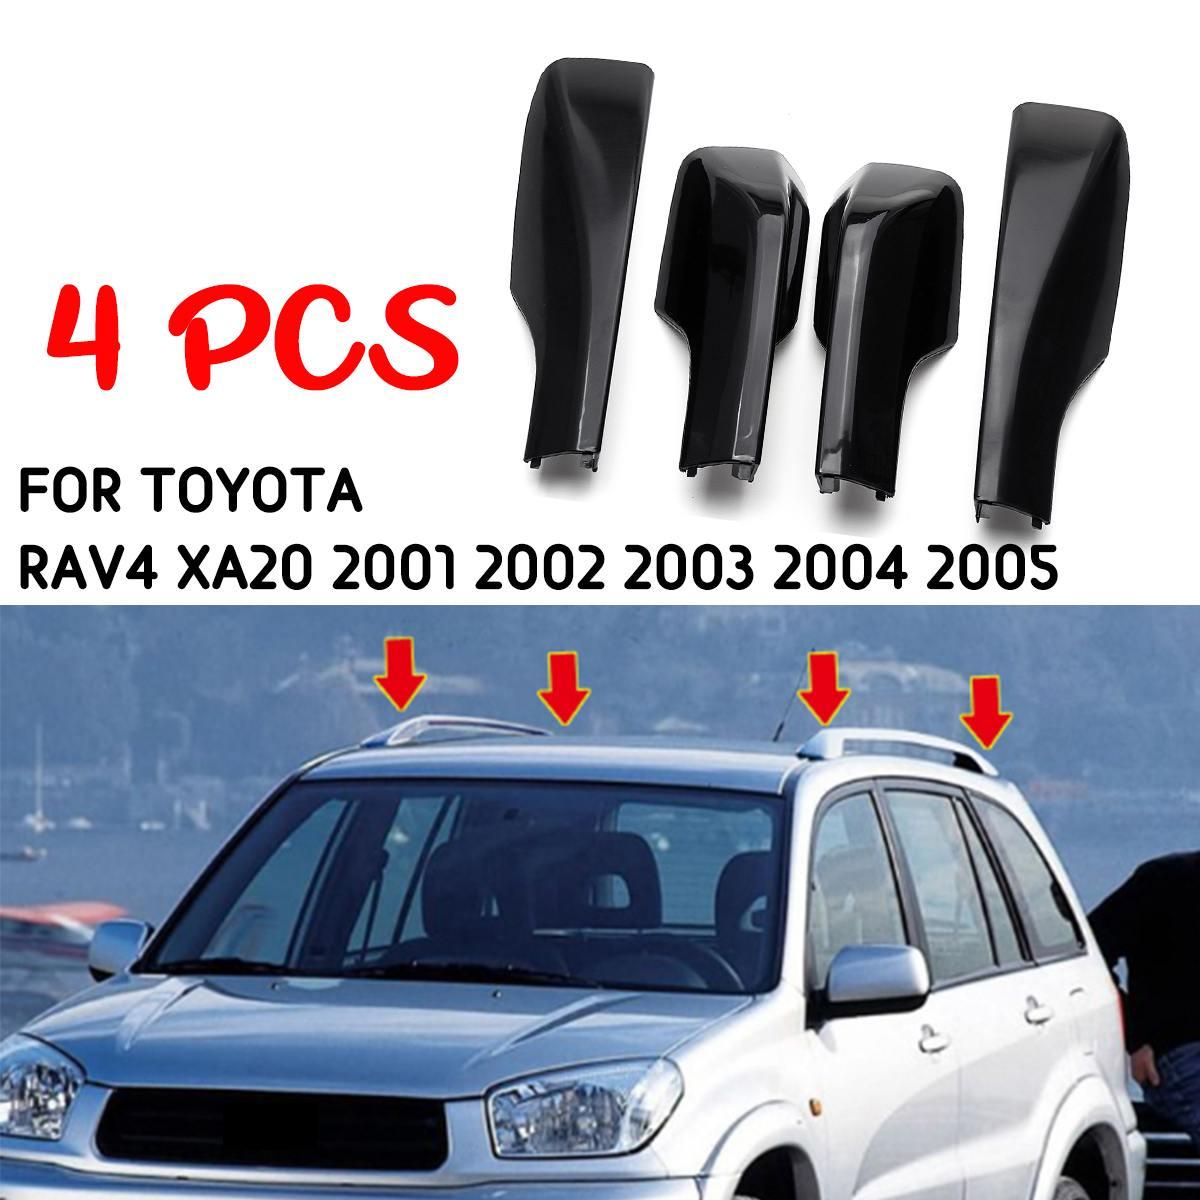 4 adet yedek Toyota RAV4 XA20 2001 2002 2003 2004 2005 siyah araba Styling portbagaj kapak Bar ray ucu kabuk aksesuarları